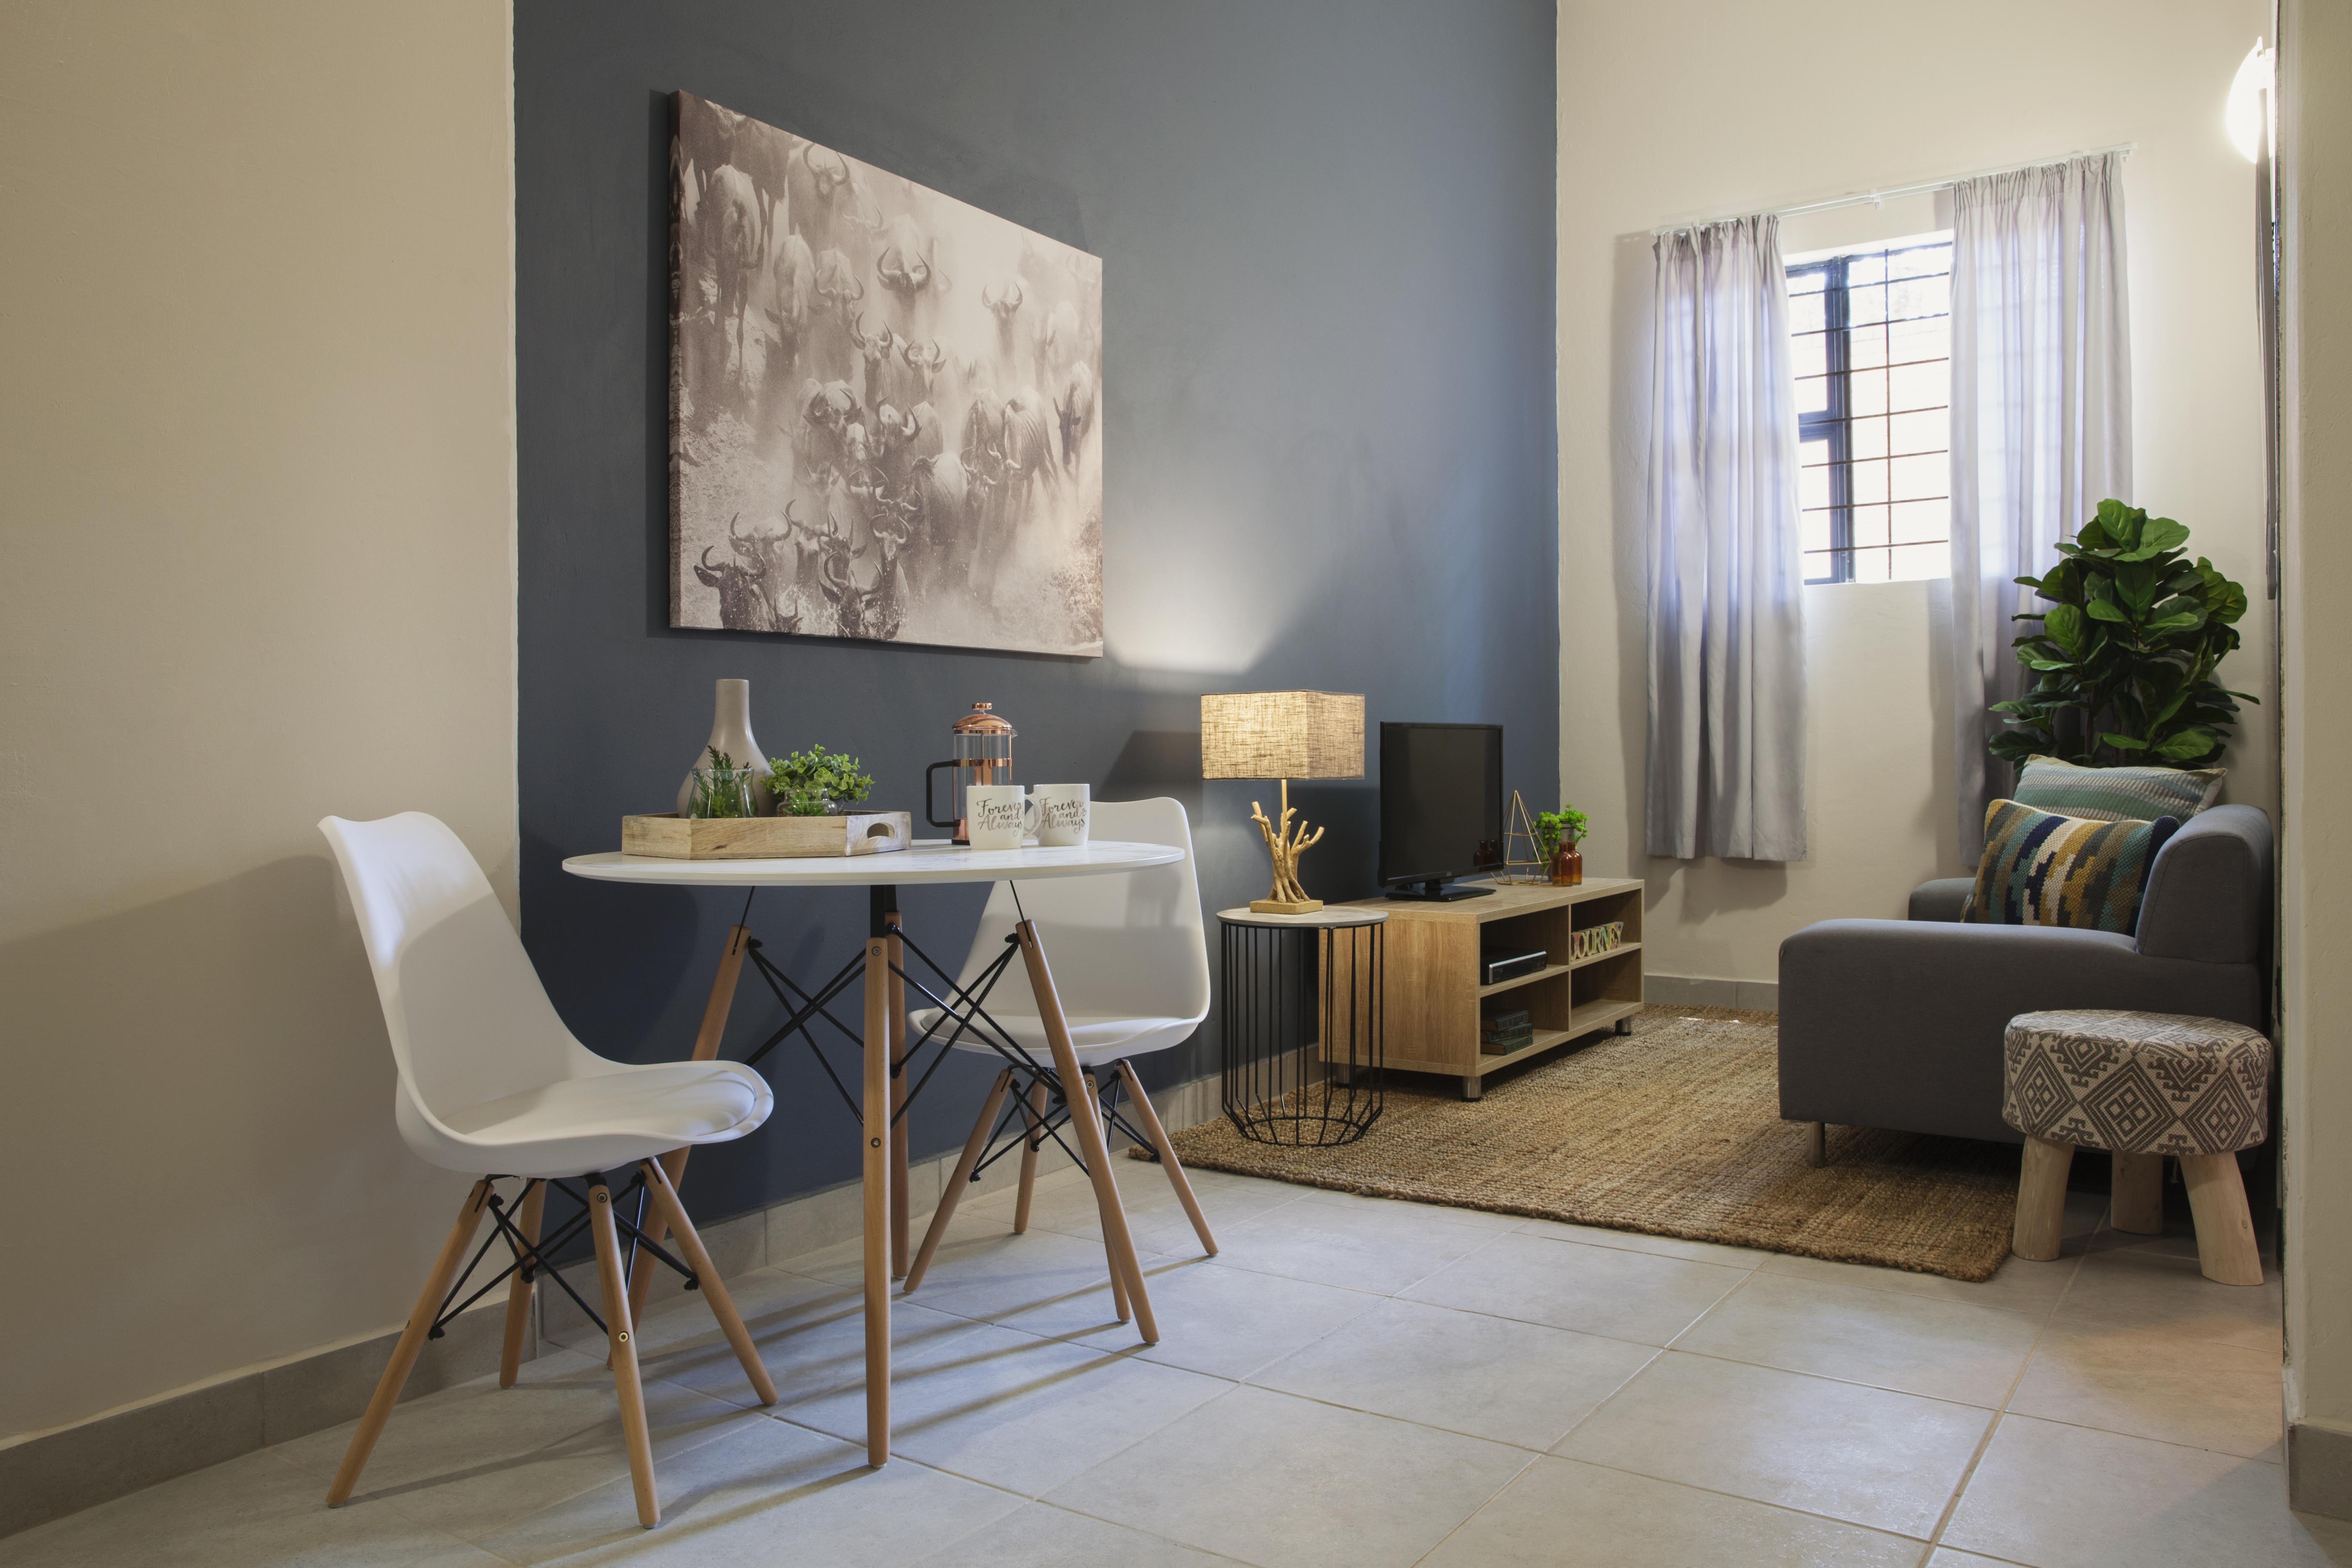 Mafadi Property Sales